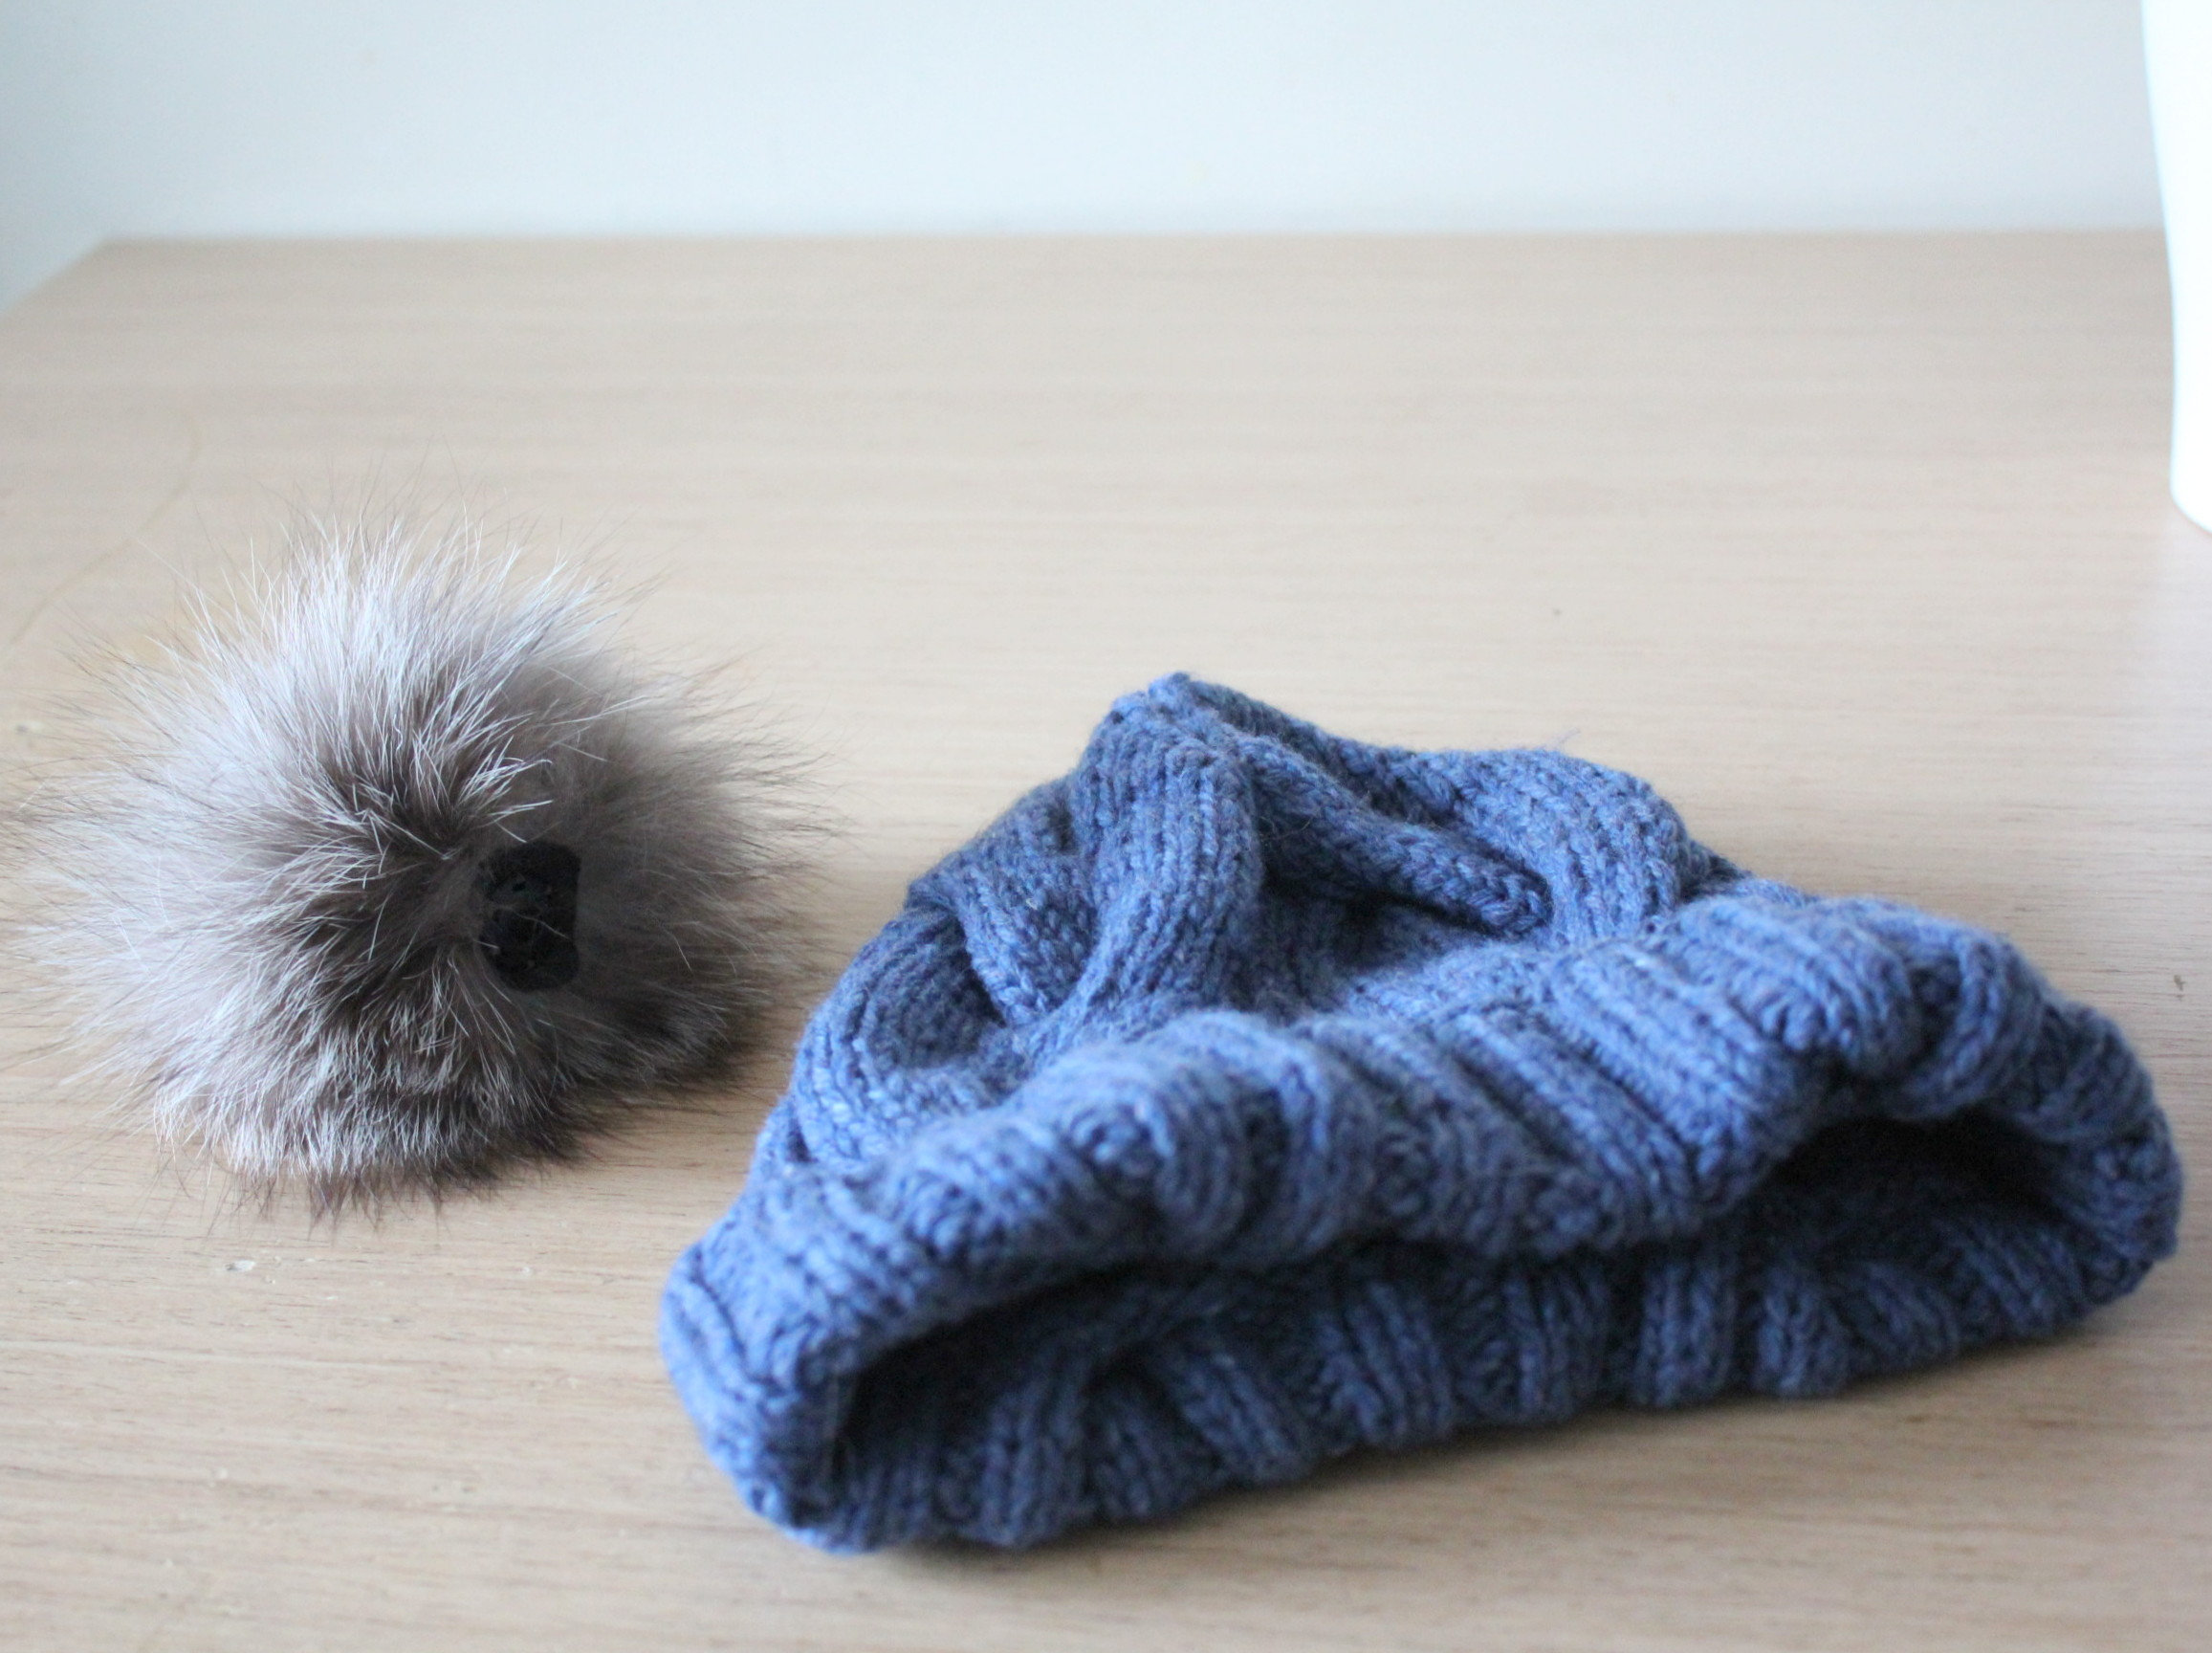 Denim Blue cashmere and wool cable knit hat with fox fur pom pom, Detachable pom pom, Chunky knit hat